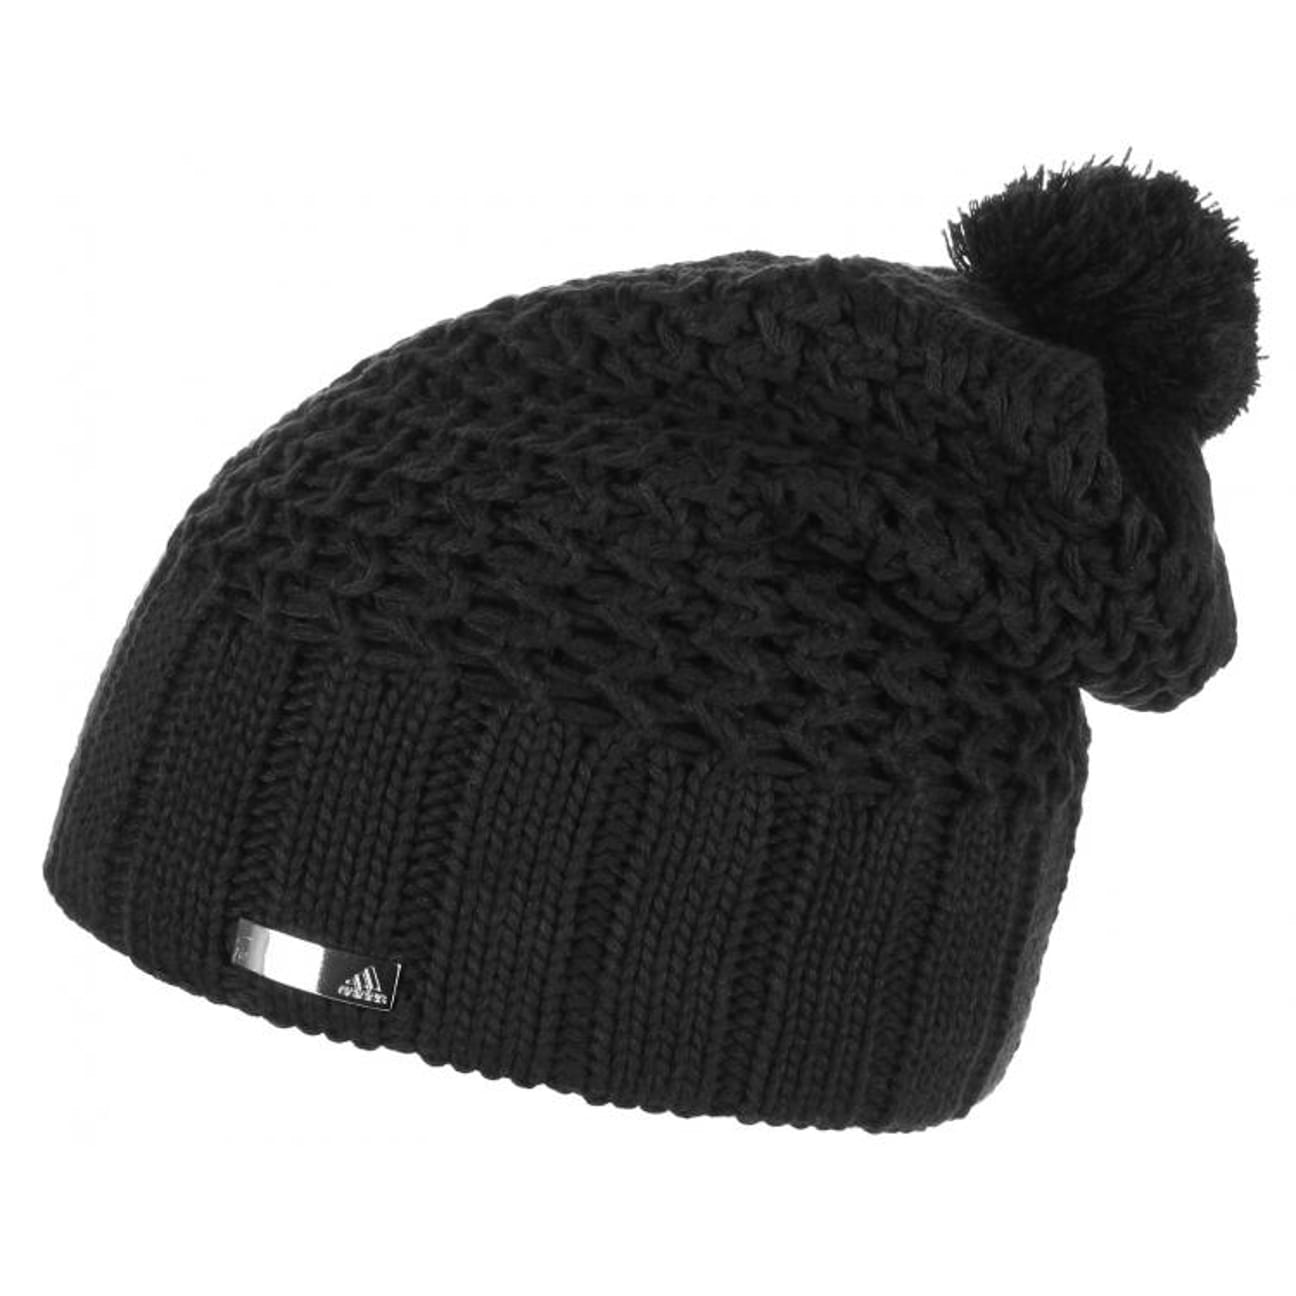 Culture Woolie Berretto Pon Pon by adidas - nero 1 ... 116e969cf521